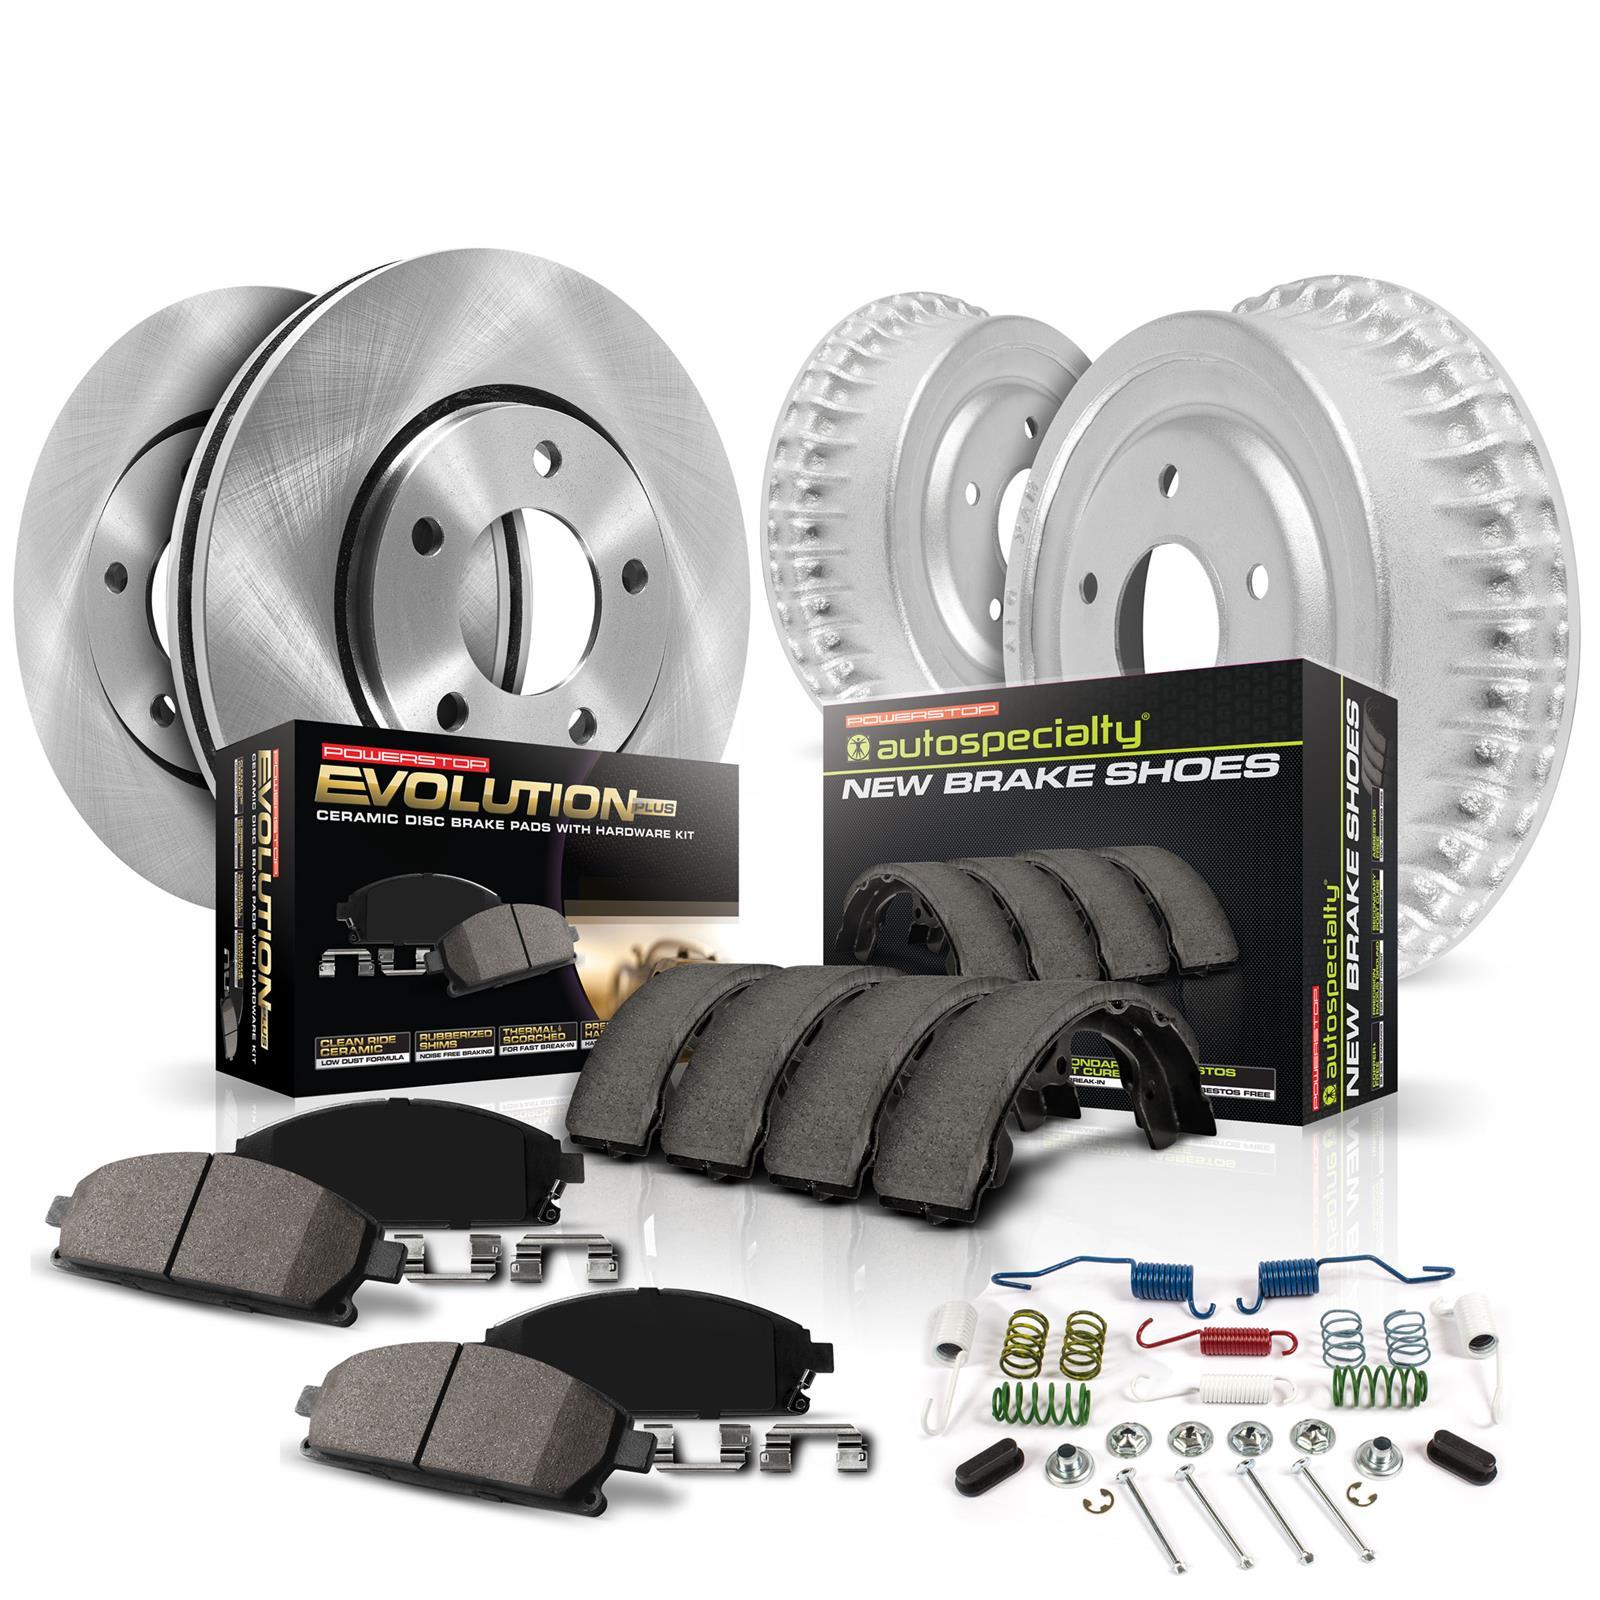 Power Stop Evolution Ceramic Disc Brake Pads for 2005-2017 Toyota Tacoma of